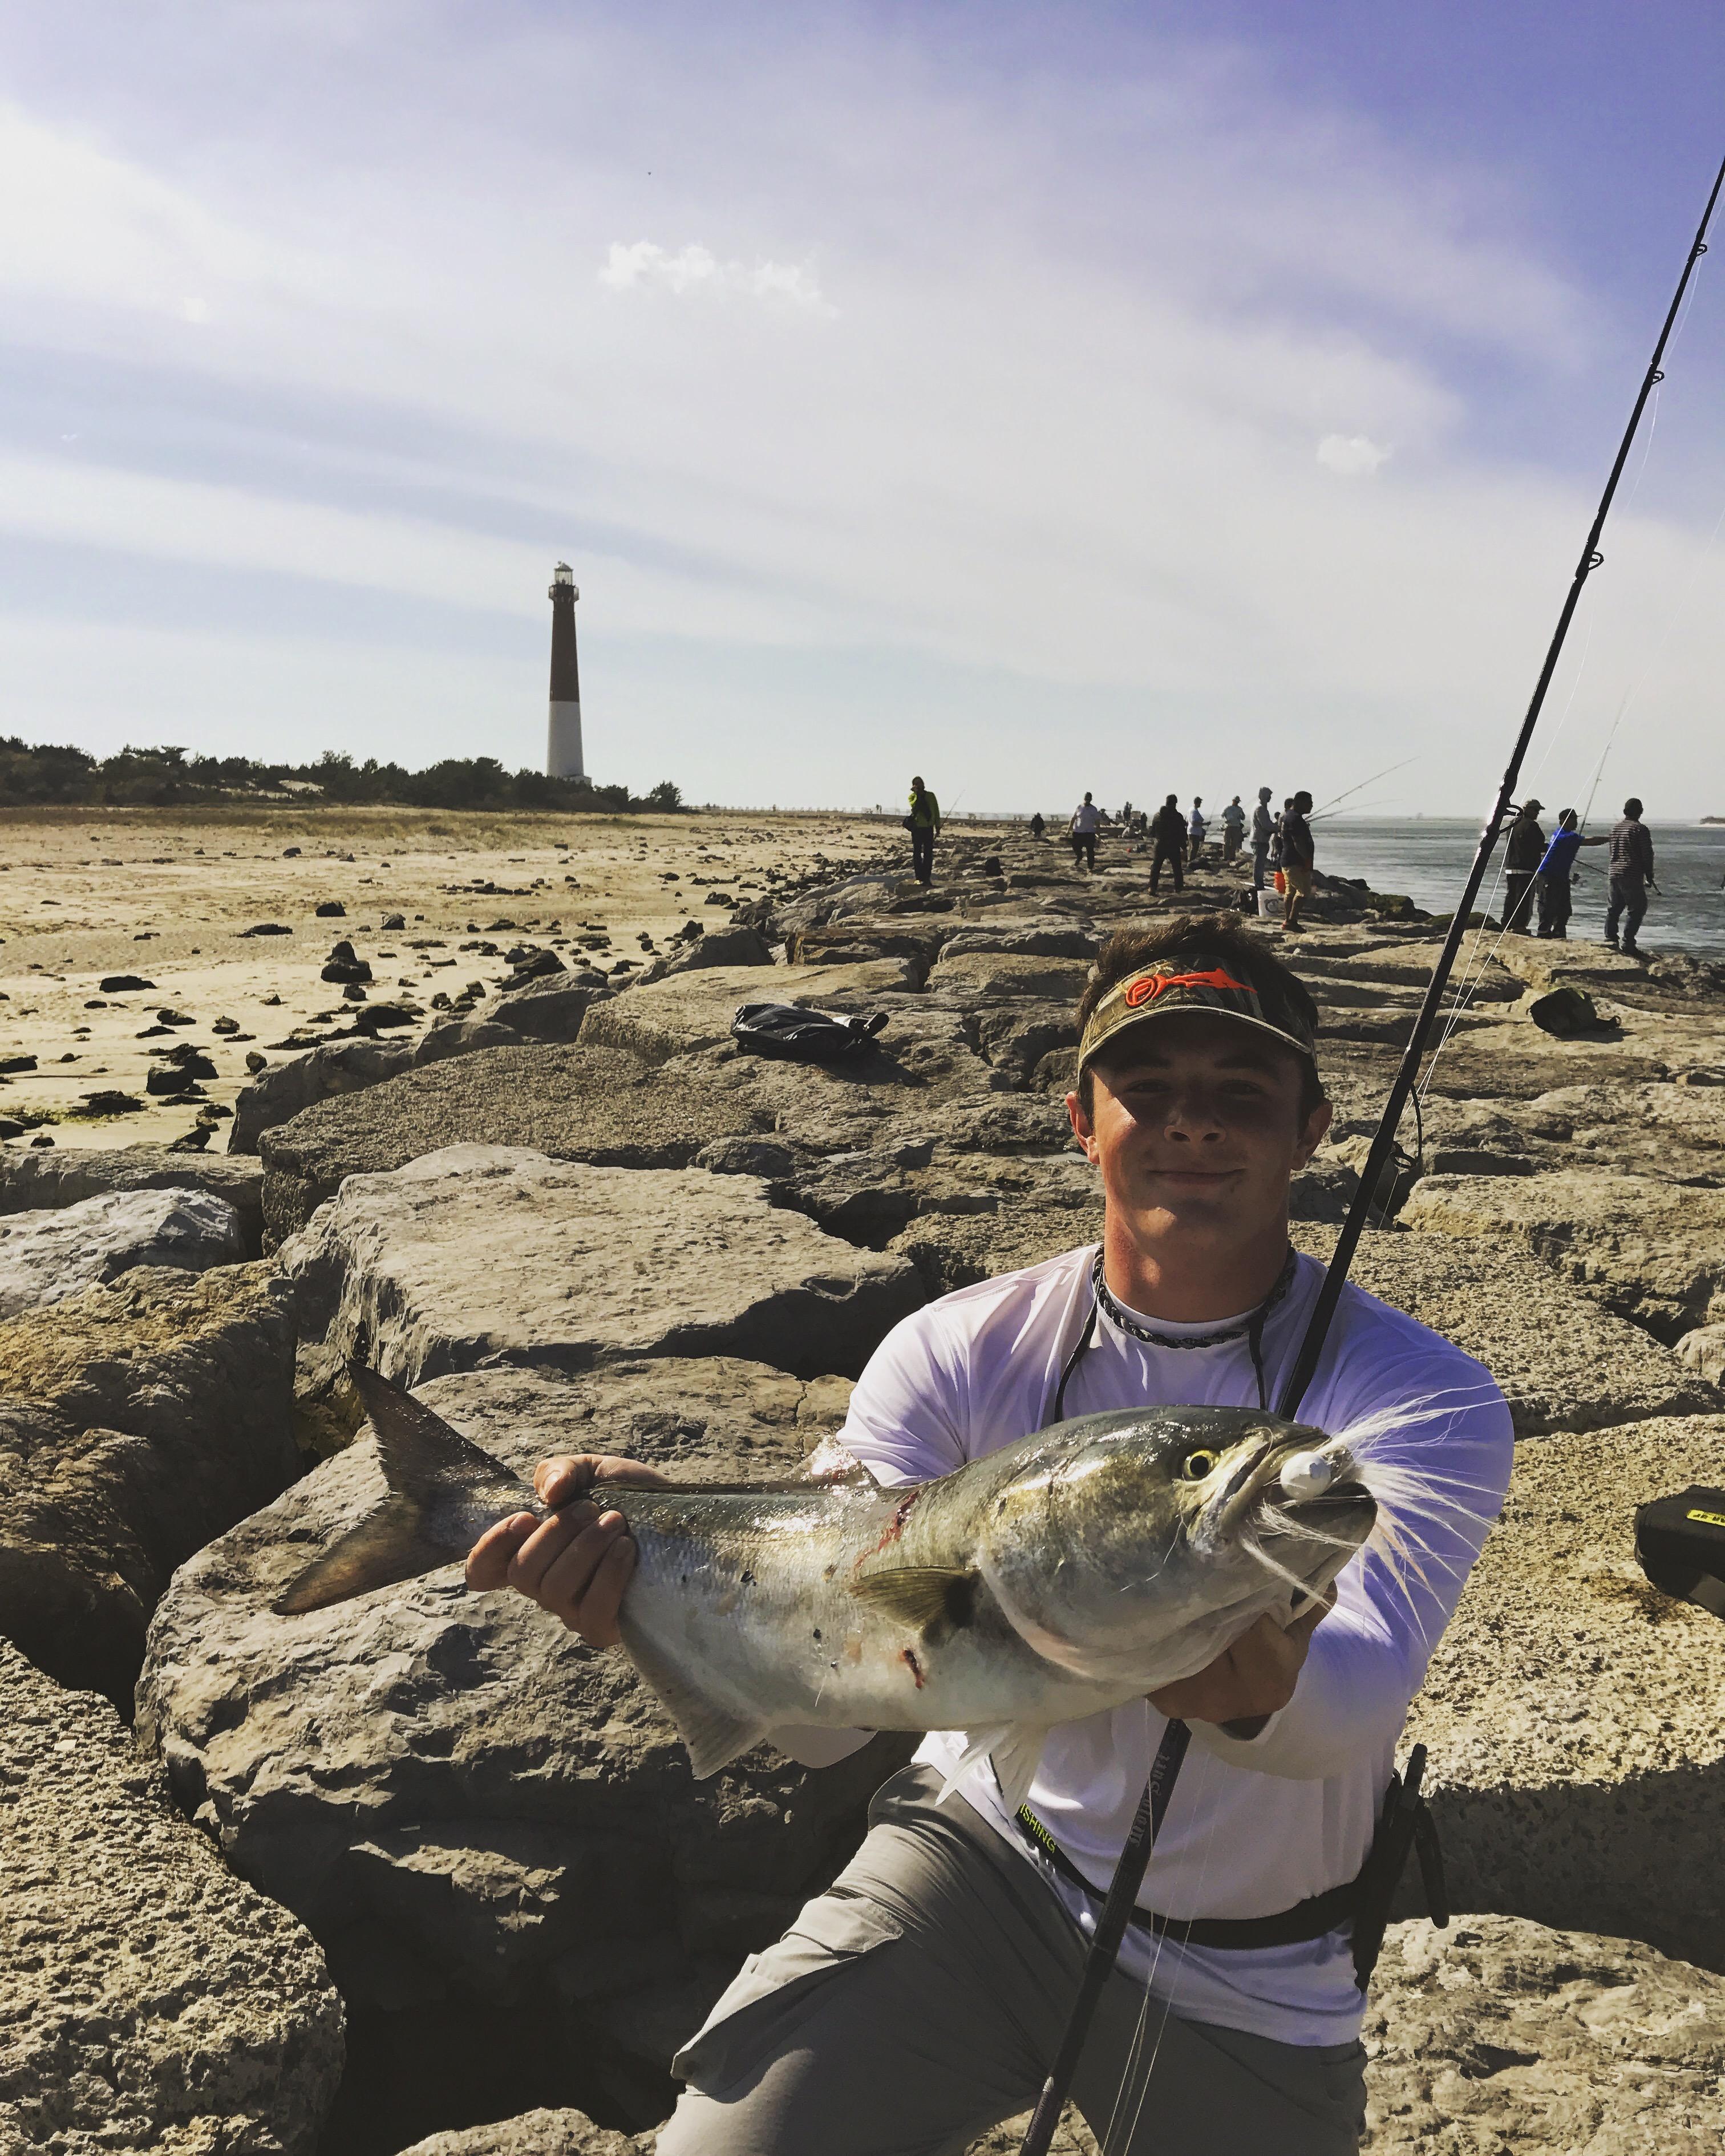 Lbi fishing report 4 29 lbi nj fishing report for Nj surf fishing report